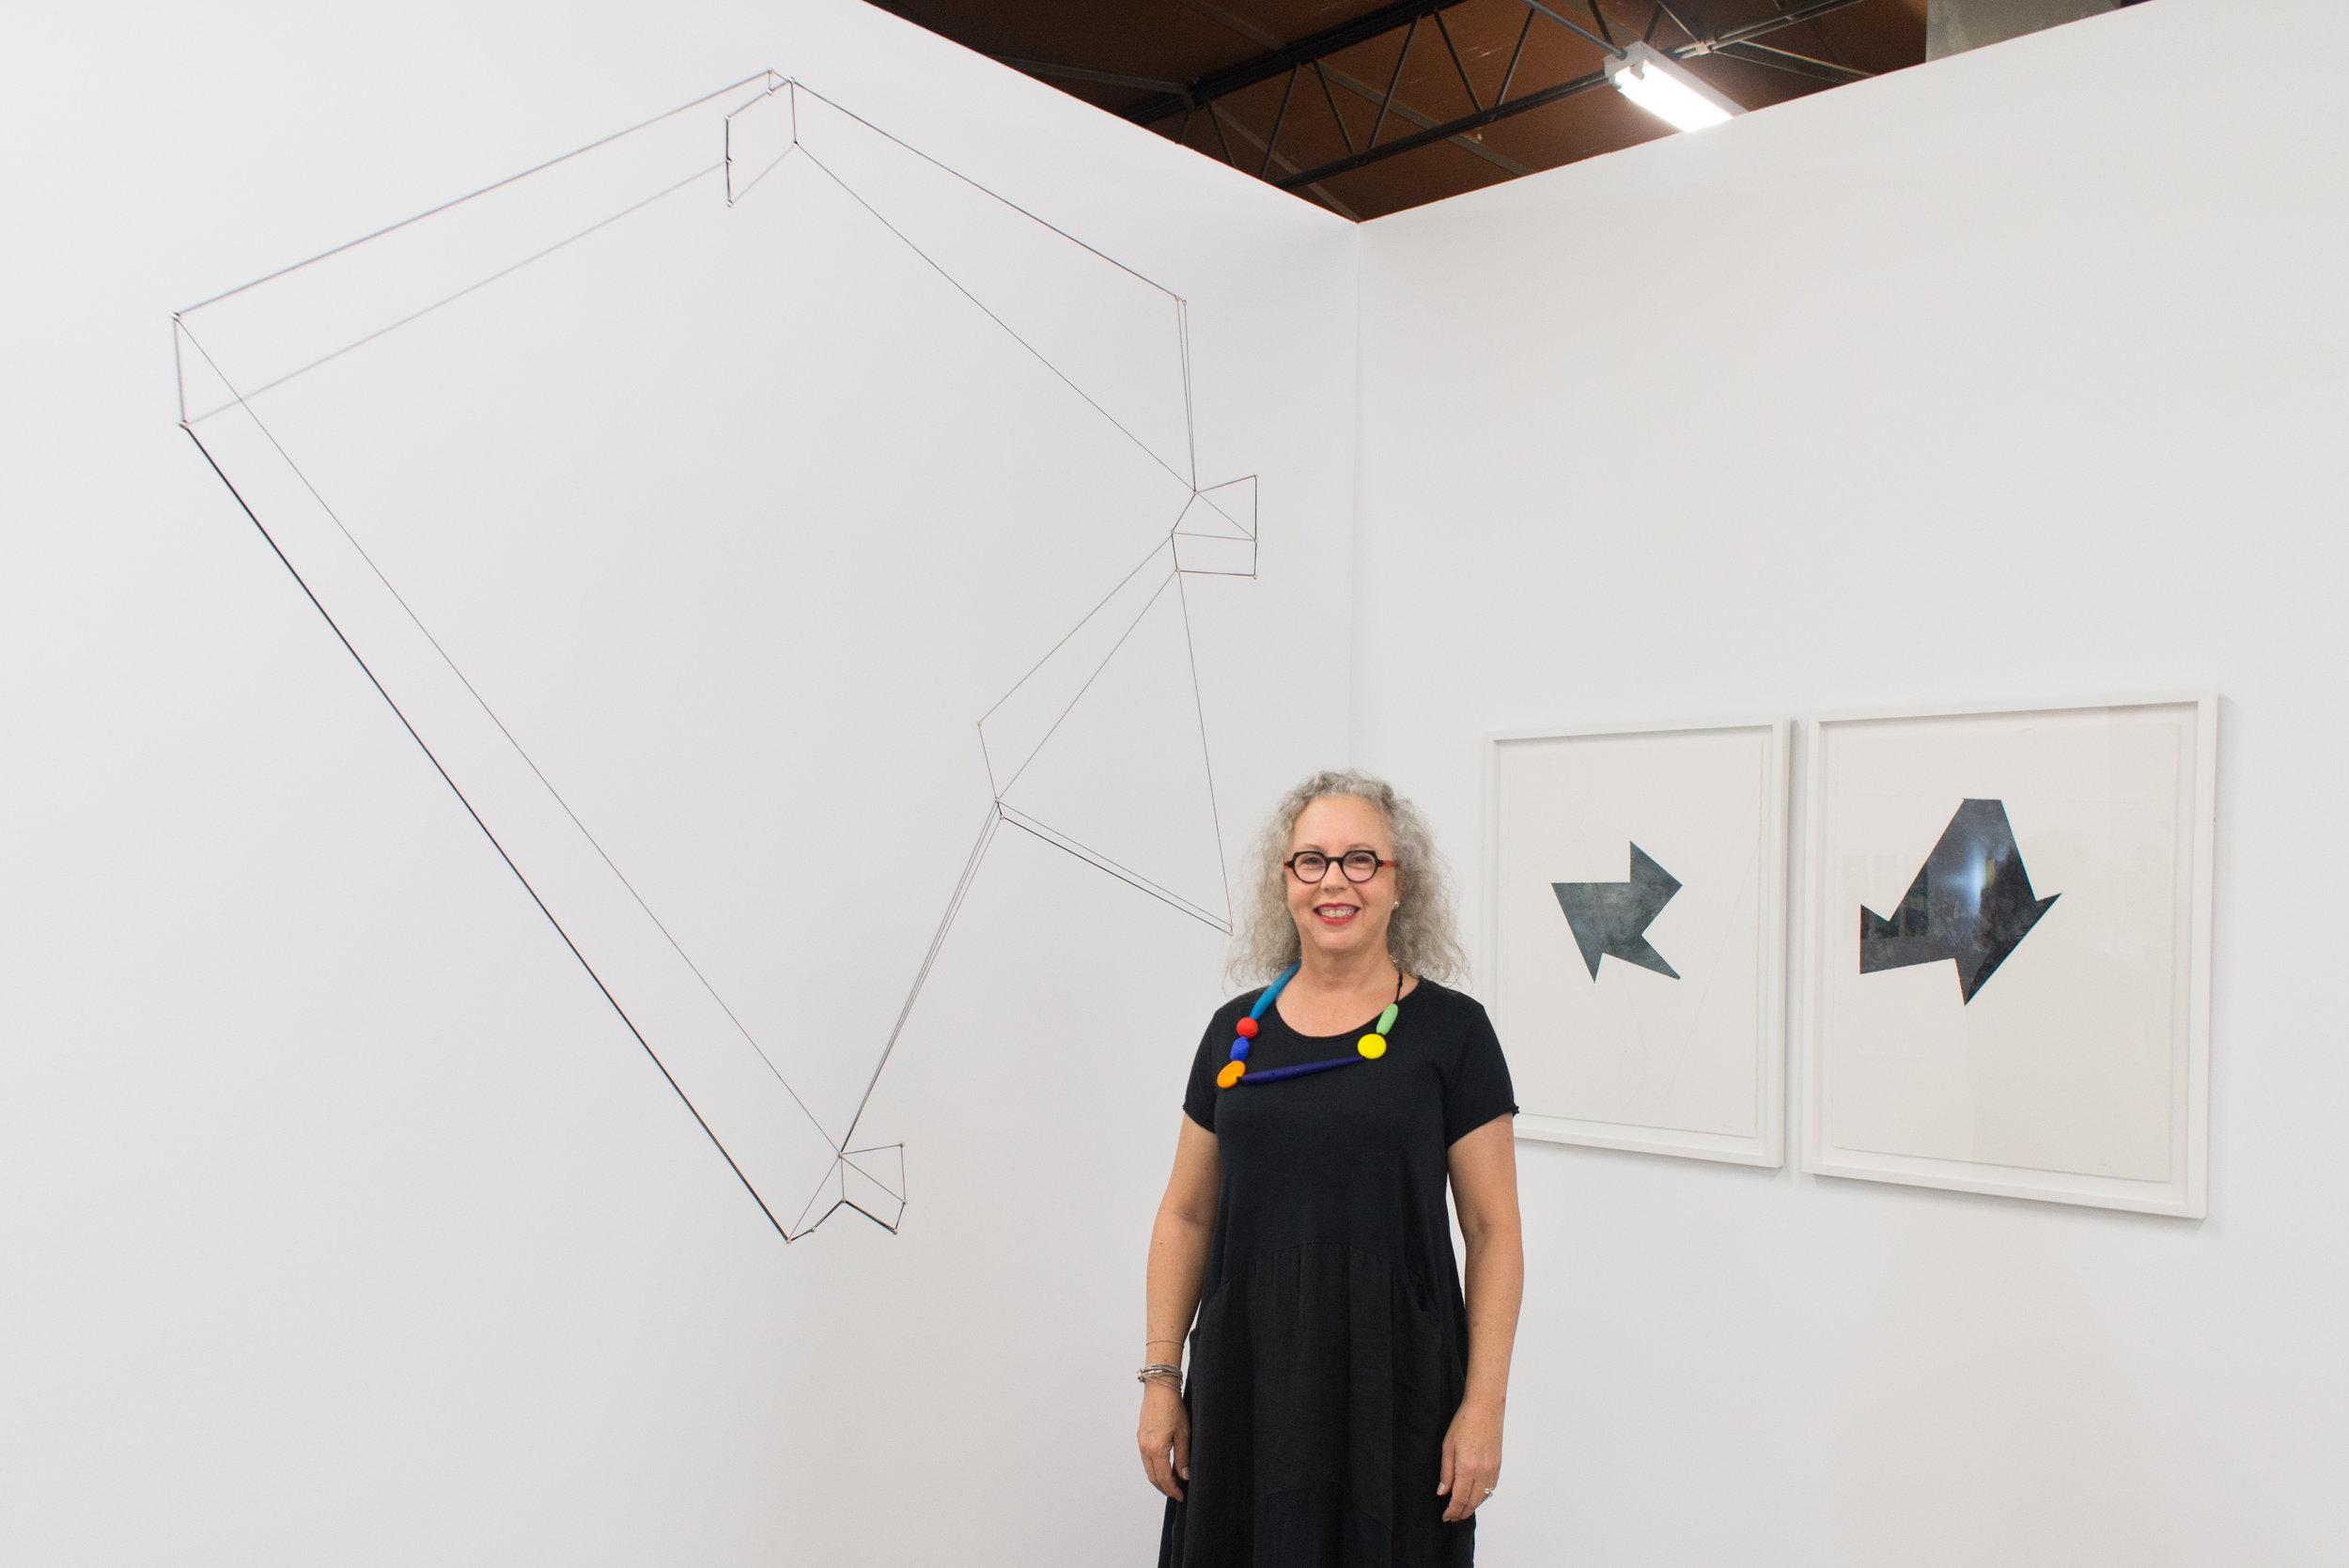 """Territory."" Site specific installation by Luisa Duarte for theTexas Biennial 2017, wax thread and thumbtacks, 77 feet x 11 feet."